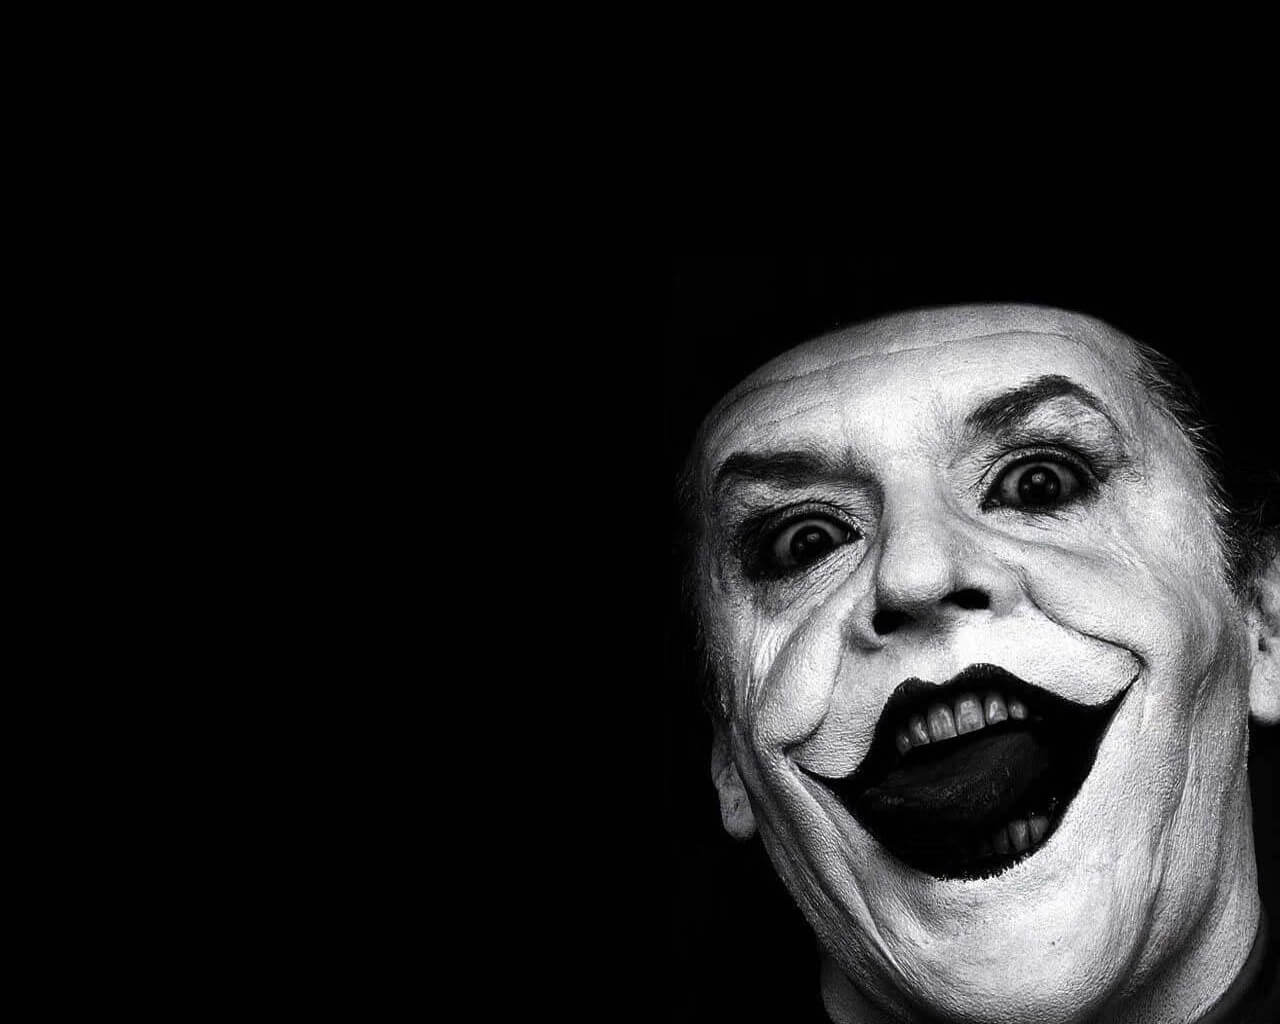 1280x1024pixels Jack Nicholson Joker monochrome